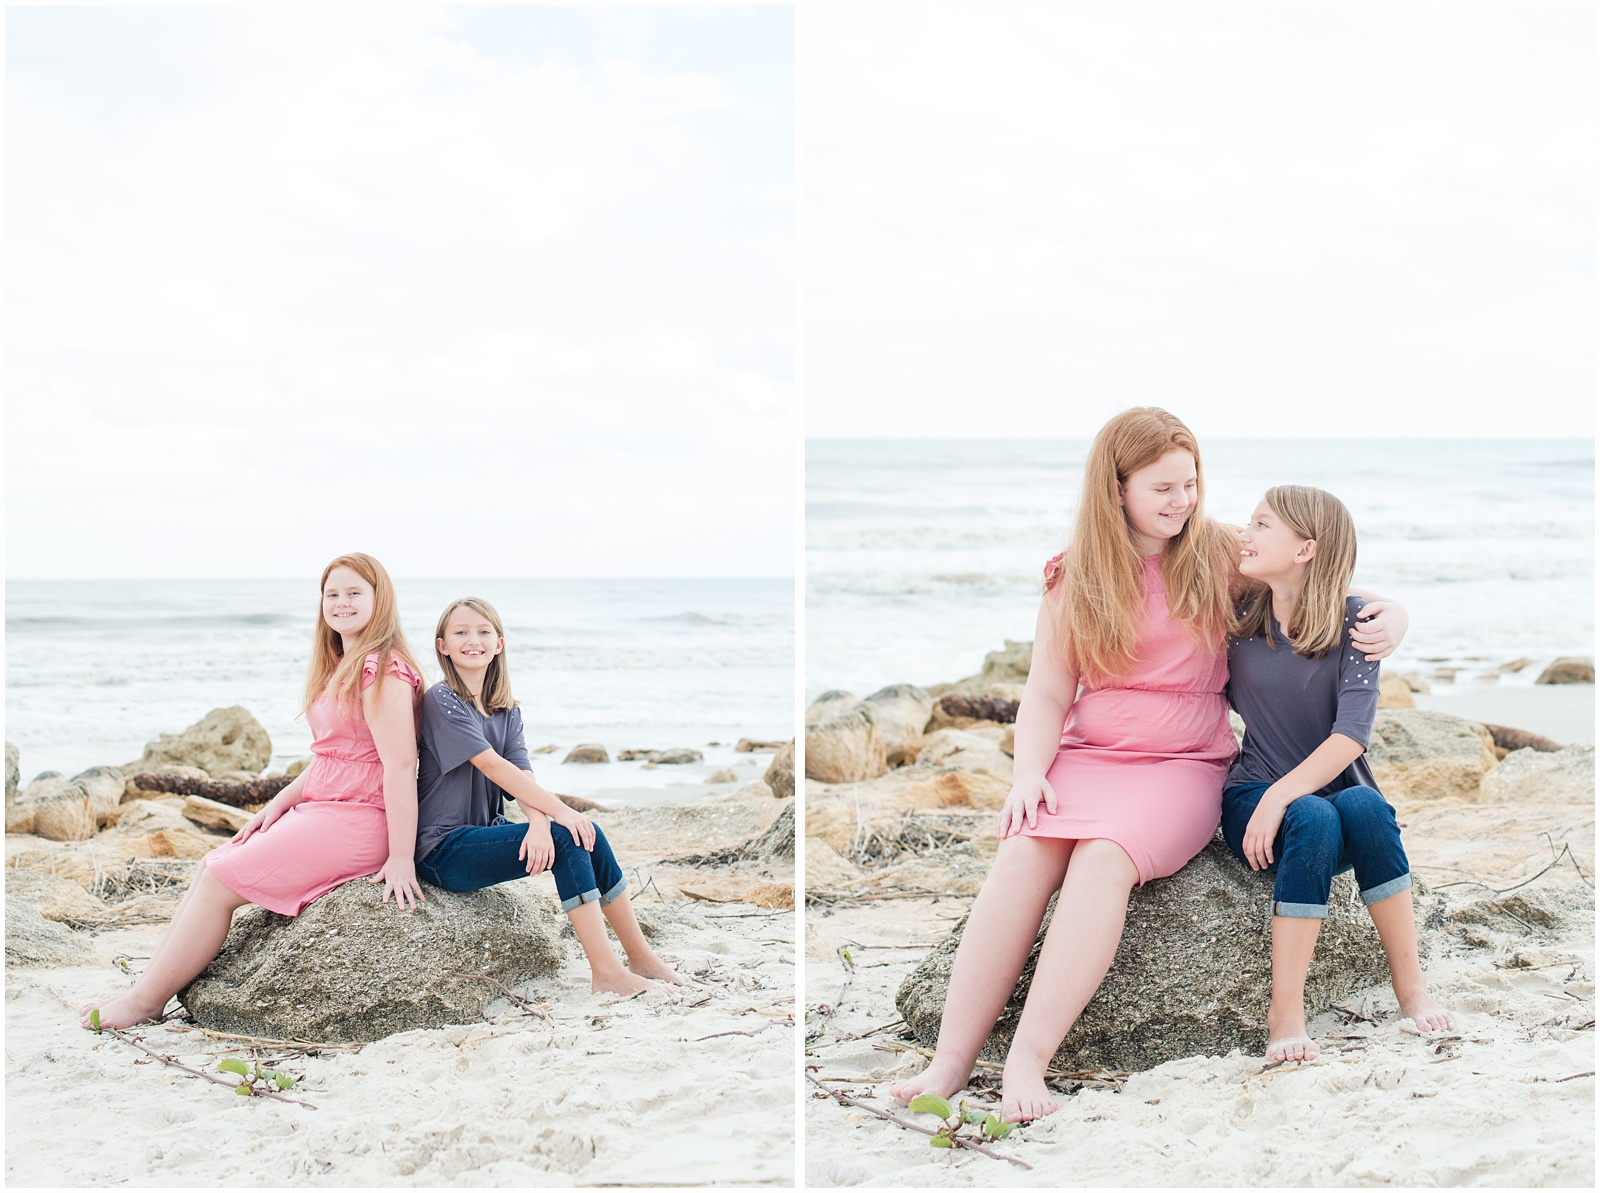 Washington Oaks_Garden_State Park_Beach_Family_Portraits_28.jpg